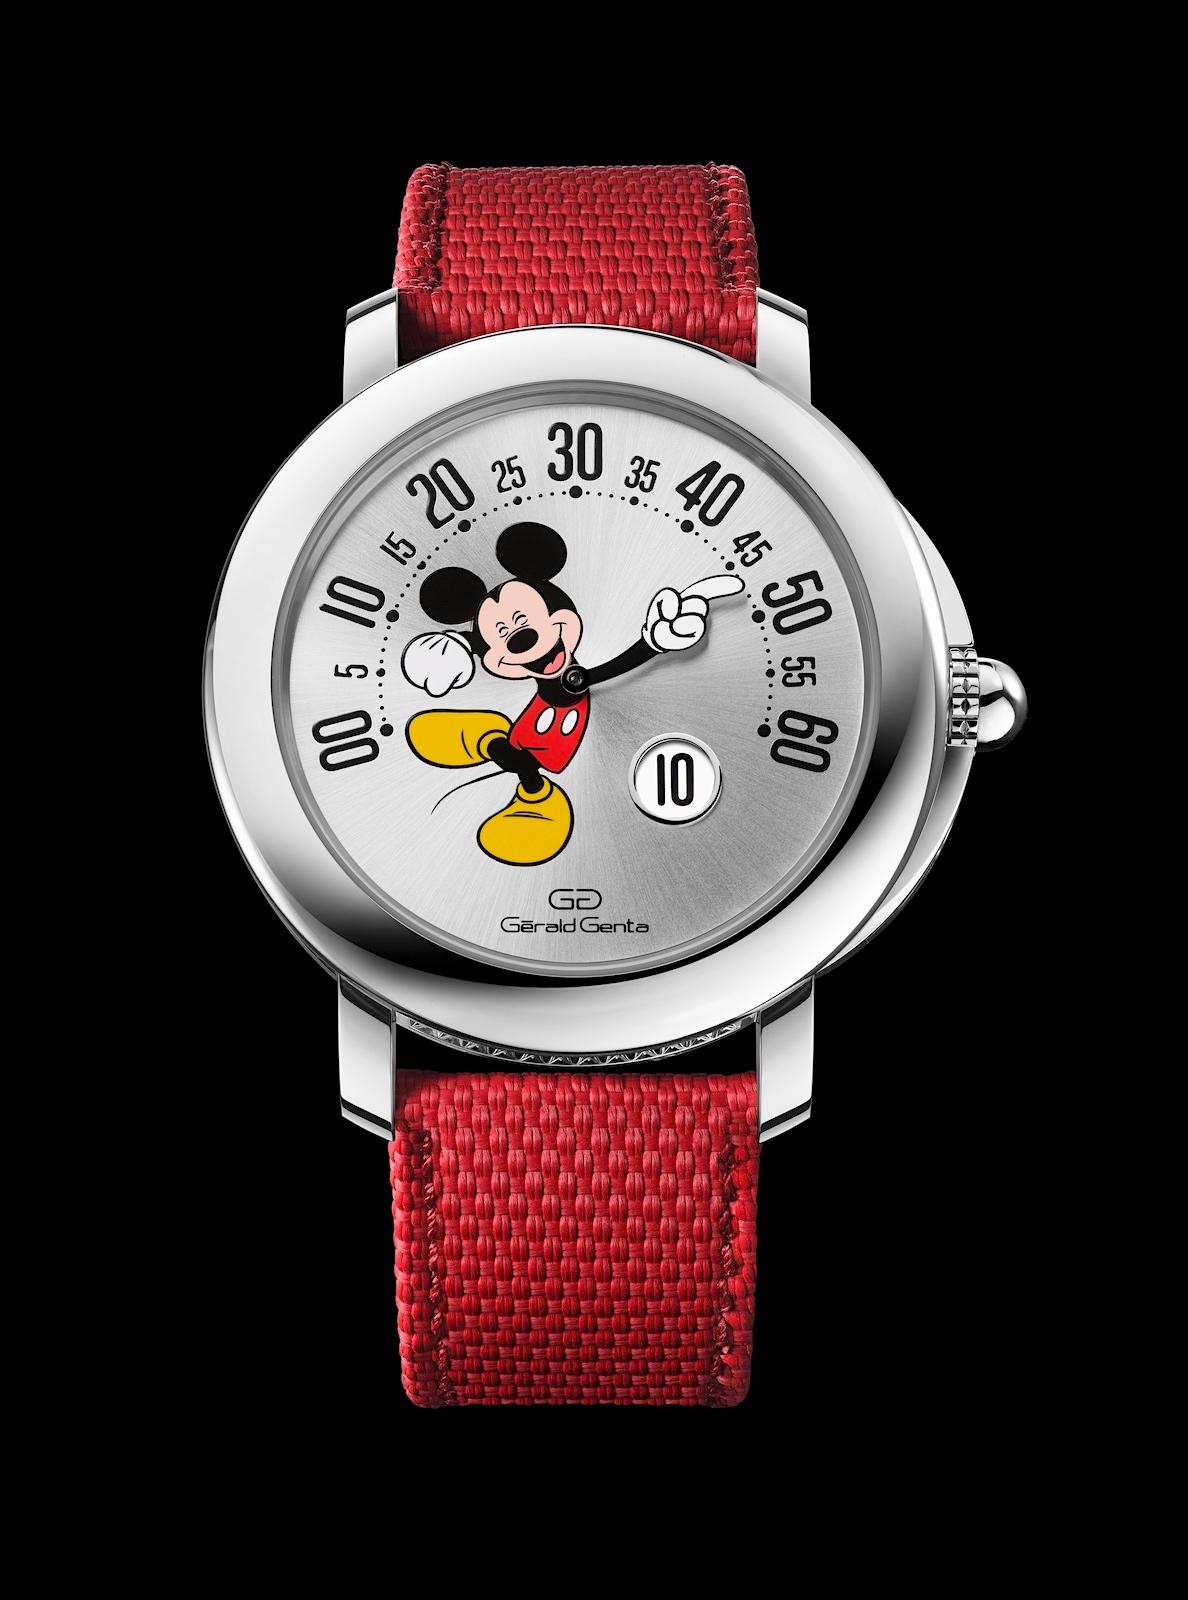 Gerald Genta Arena Retrograde Mickey Mouse - front